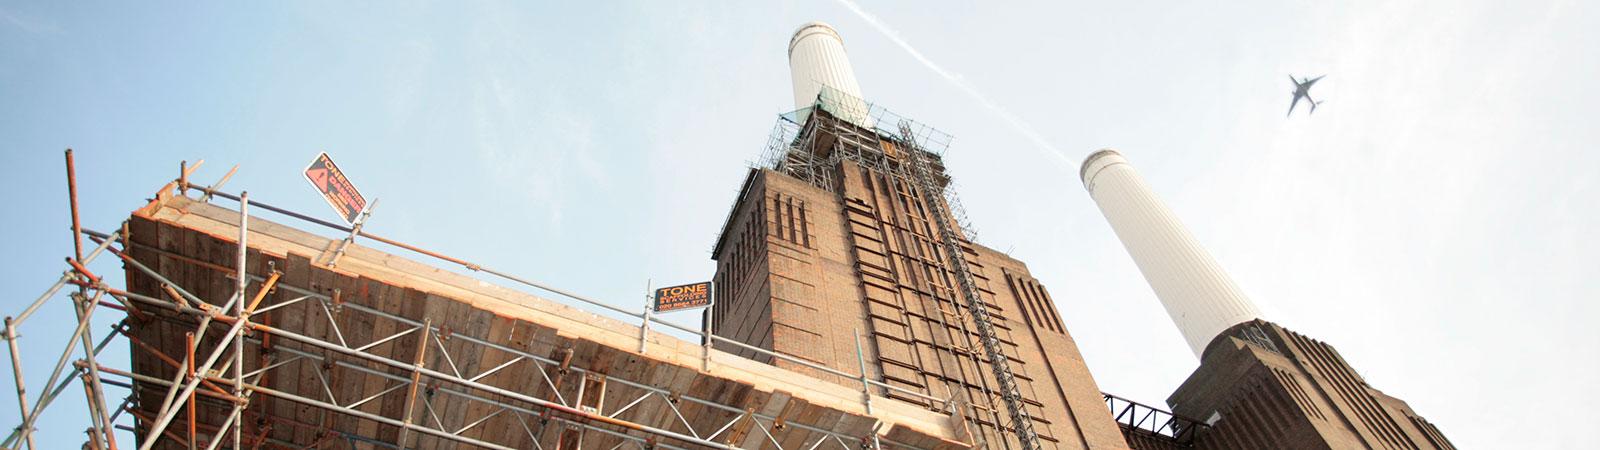 slider-home-Battersea-Power